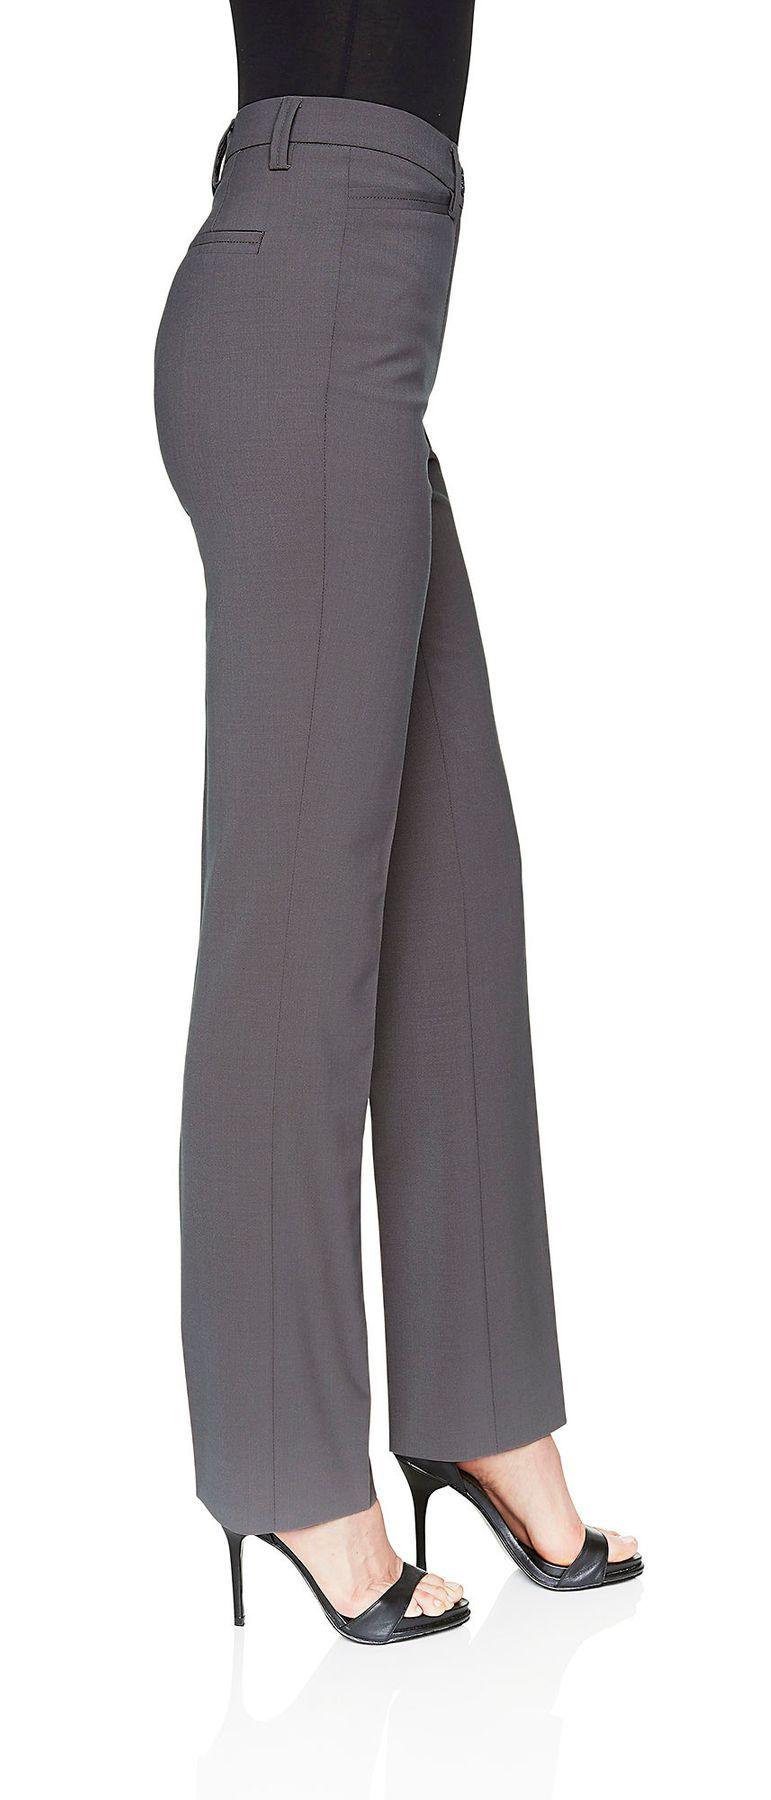 Atelier Gardeur - Special Fit - Damenhose - Kayla (061458) – Bild 7